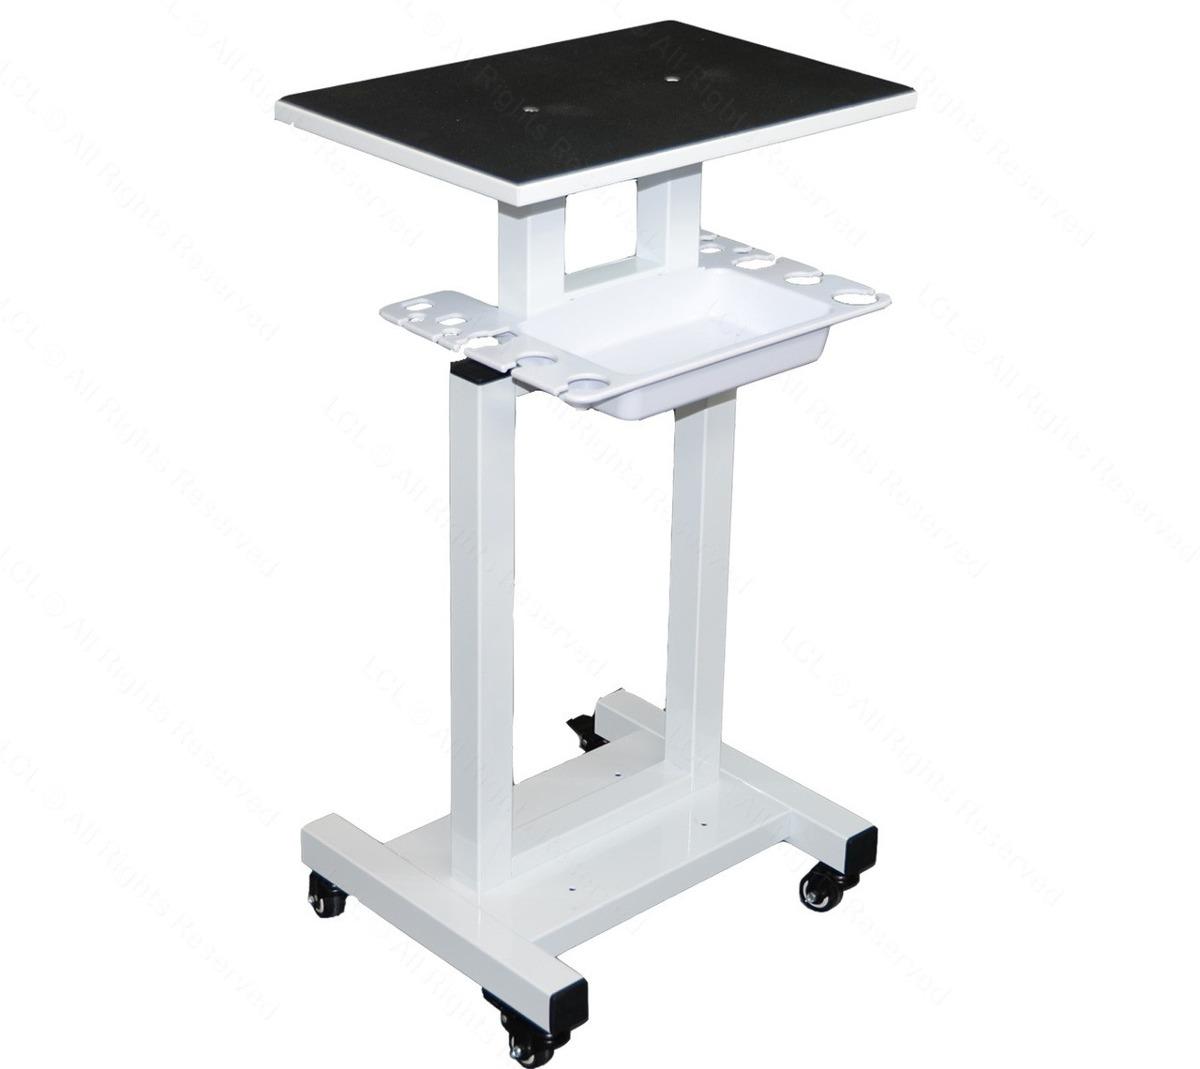 económico pedestal mesa con ruedas para maquinas spa, salon ... - Ruedas Para Mesa